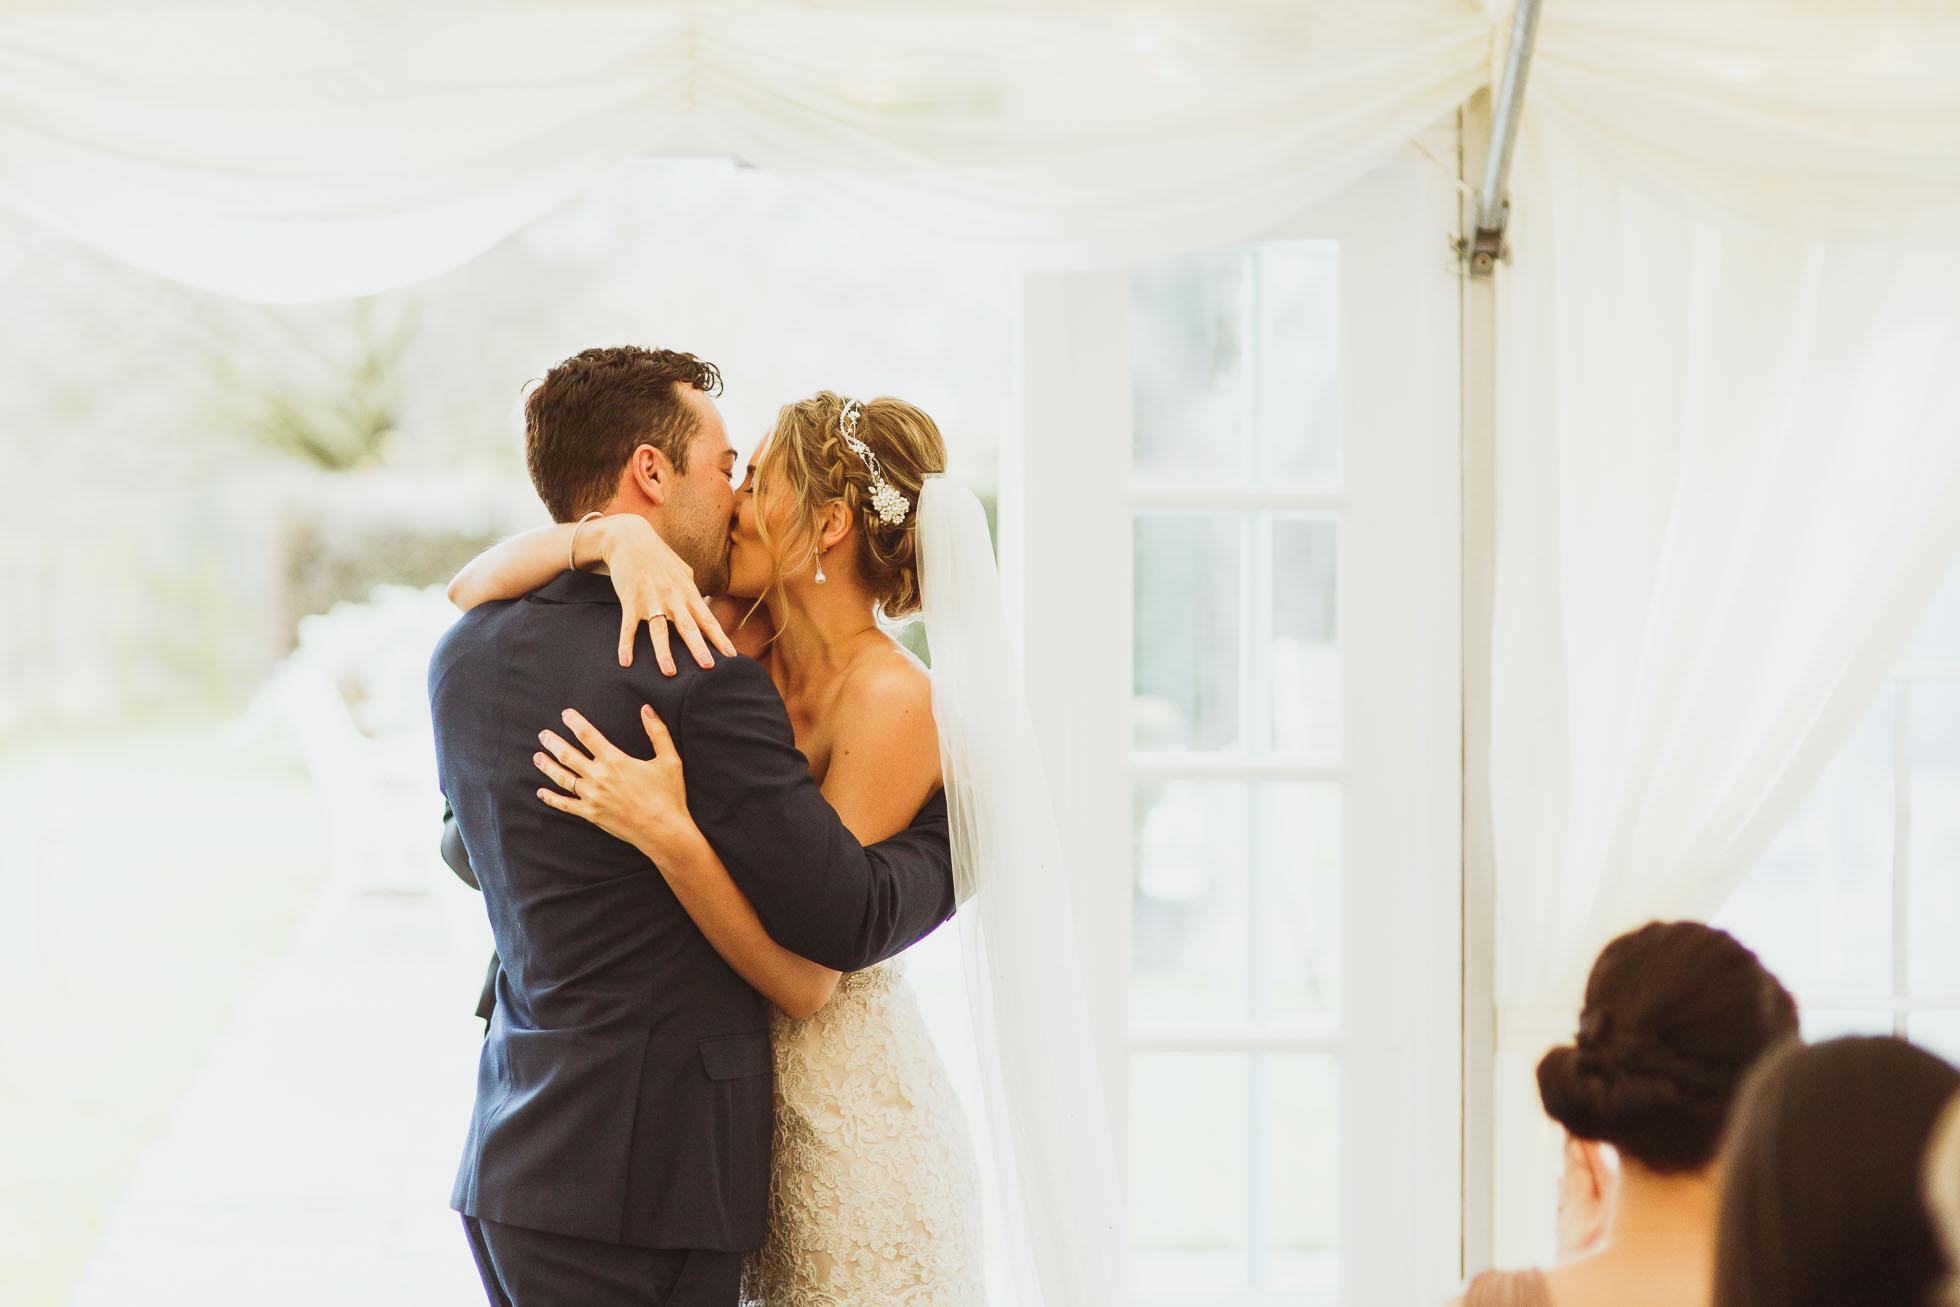 hilltop country house wedding photographer-39.jpg